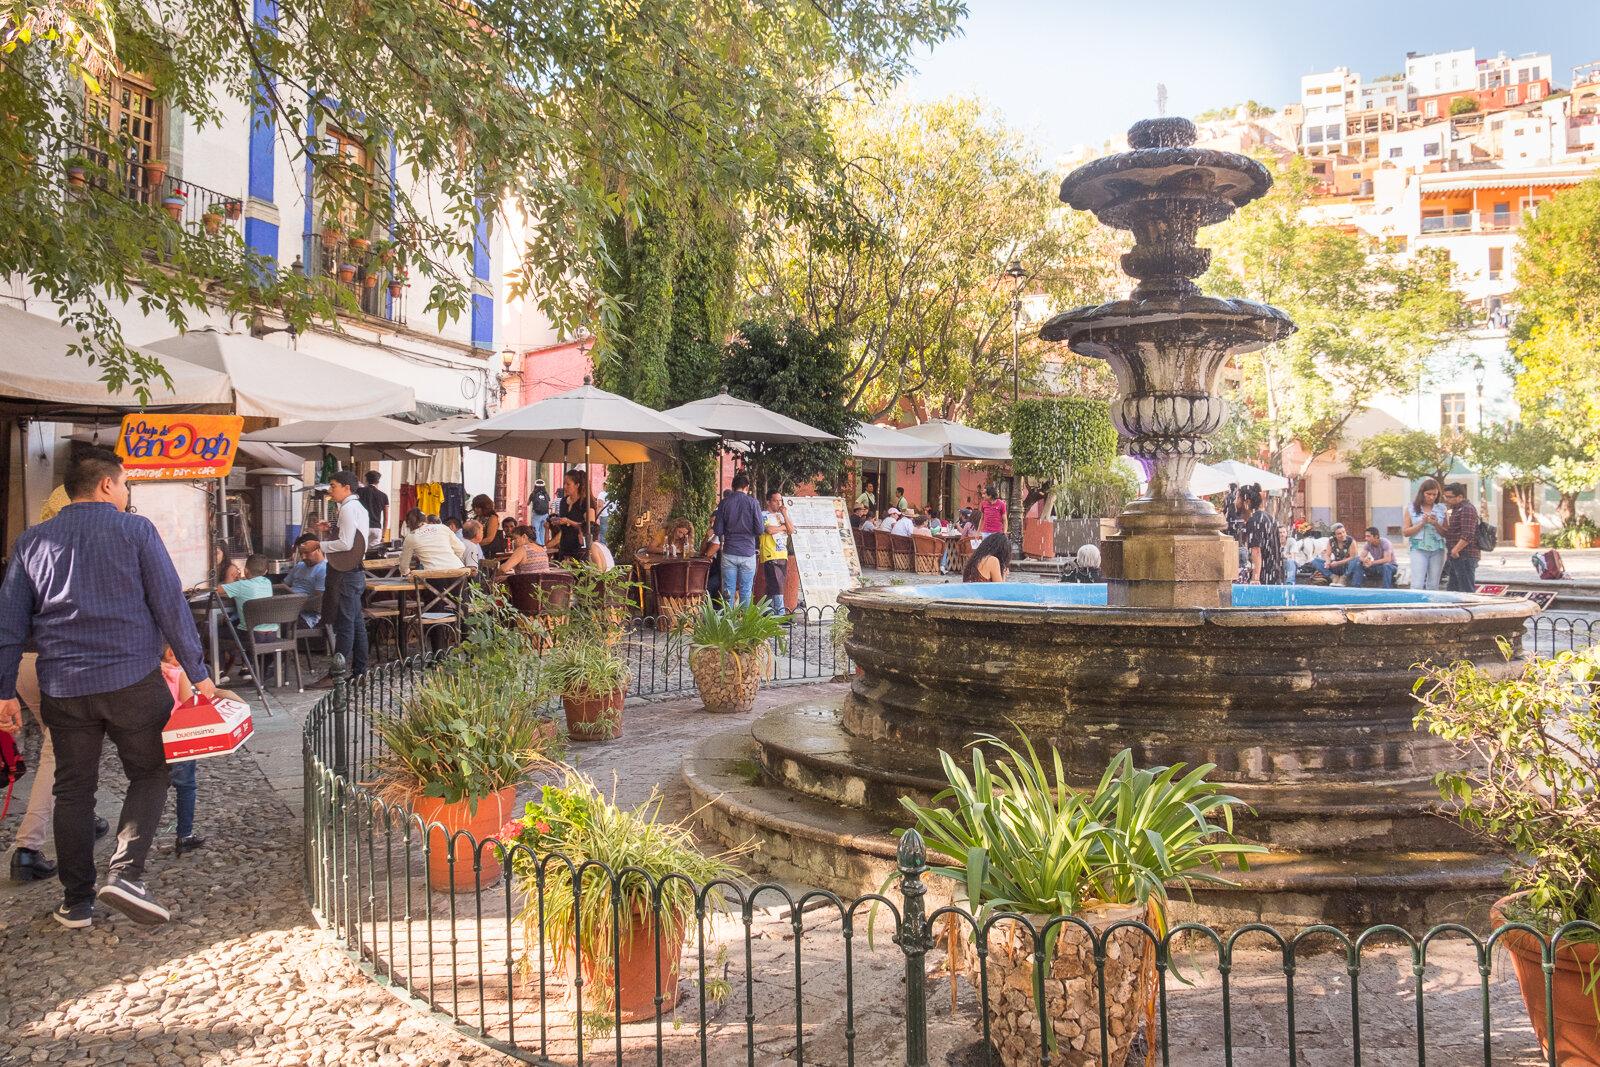 2019.10.8_Mexico_Guanajuato15_Britt first year.jpg